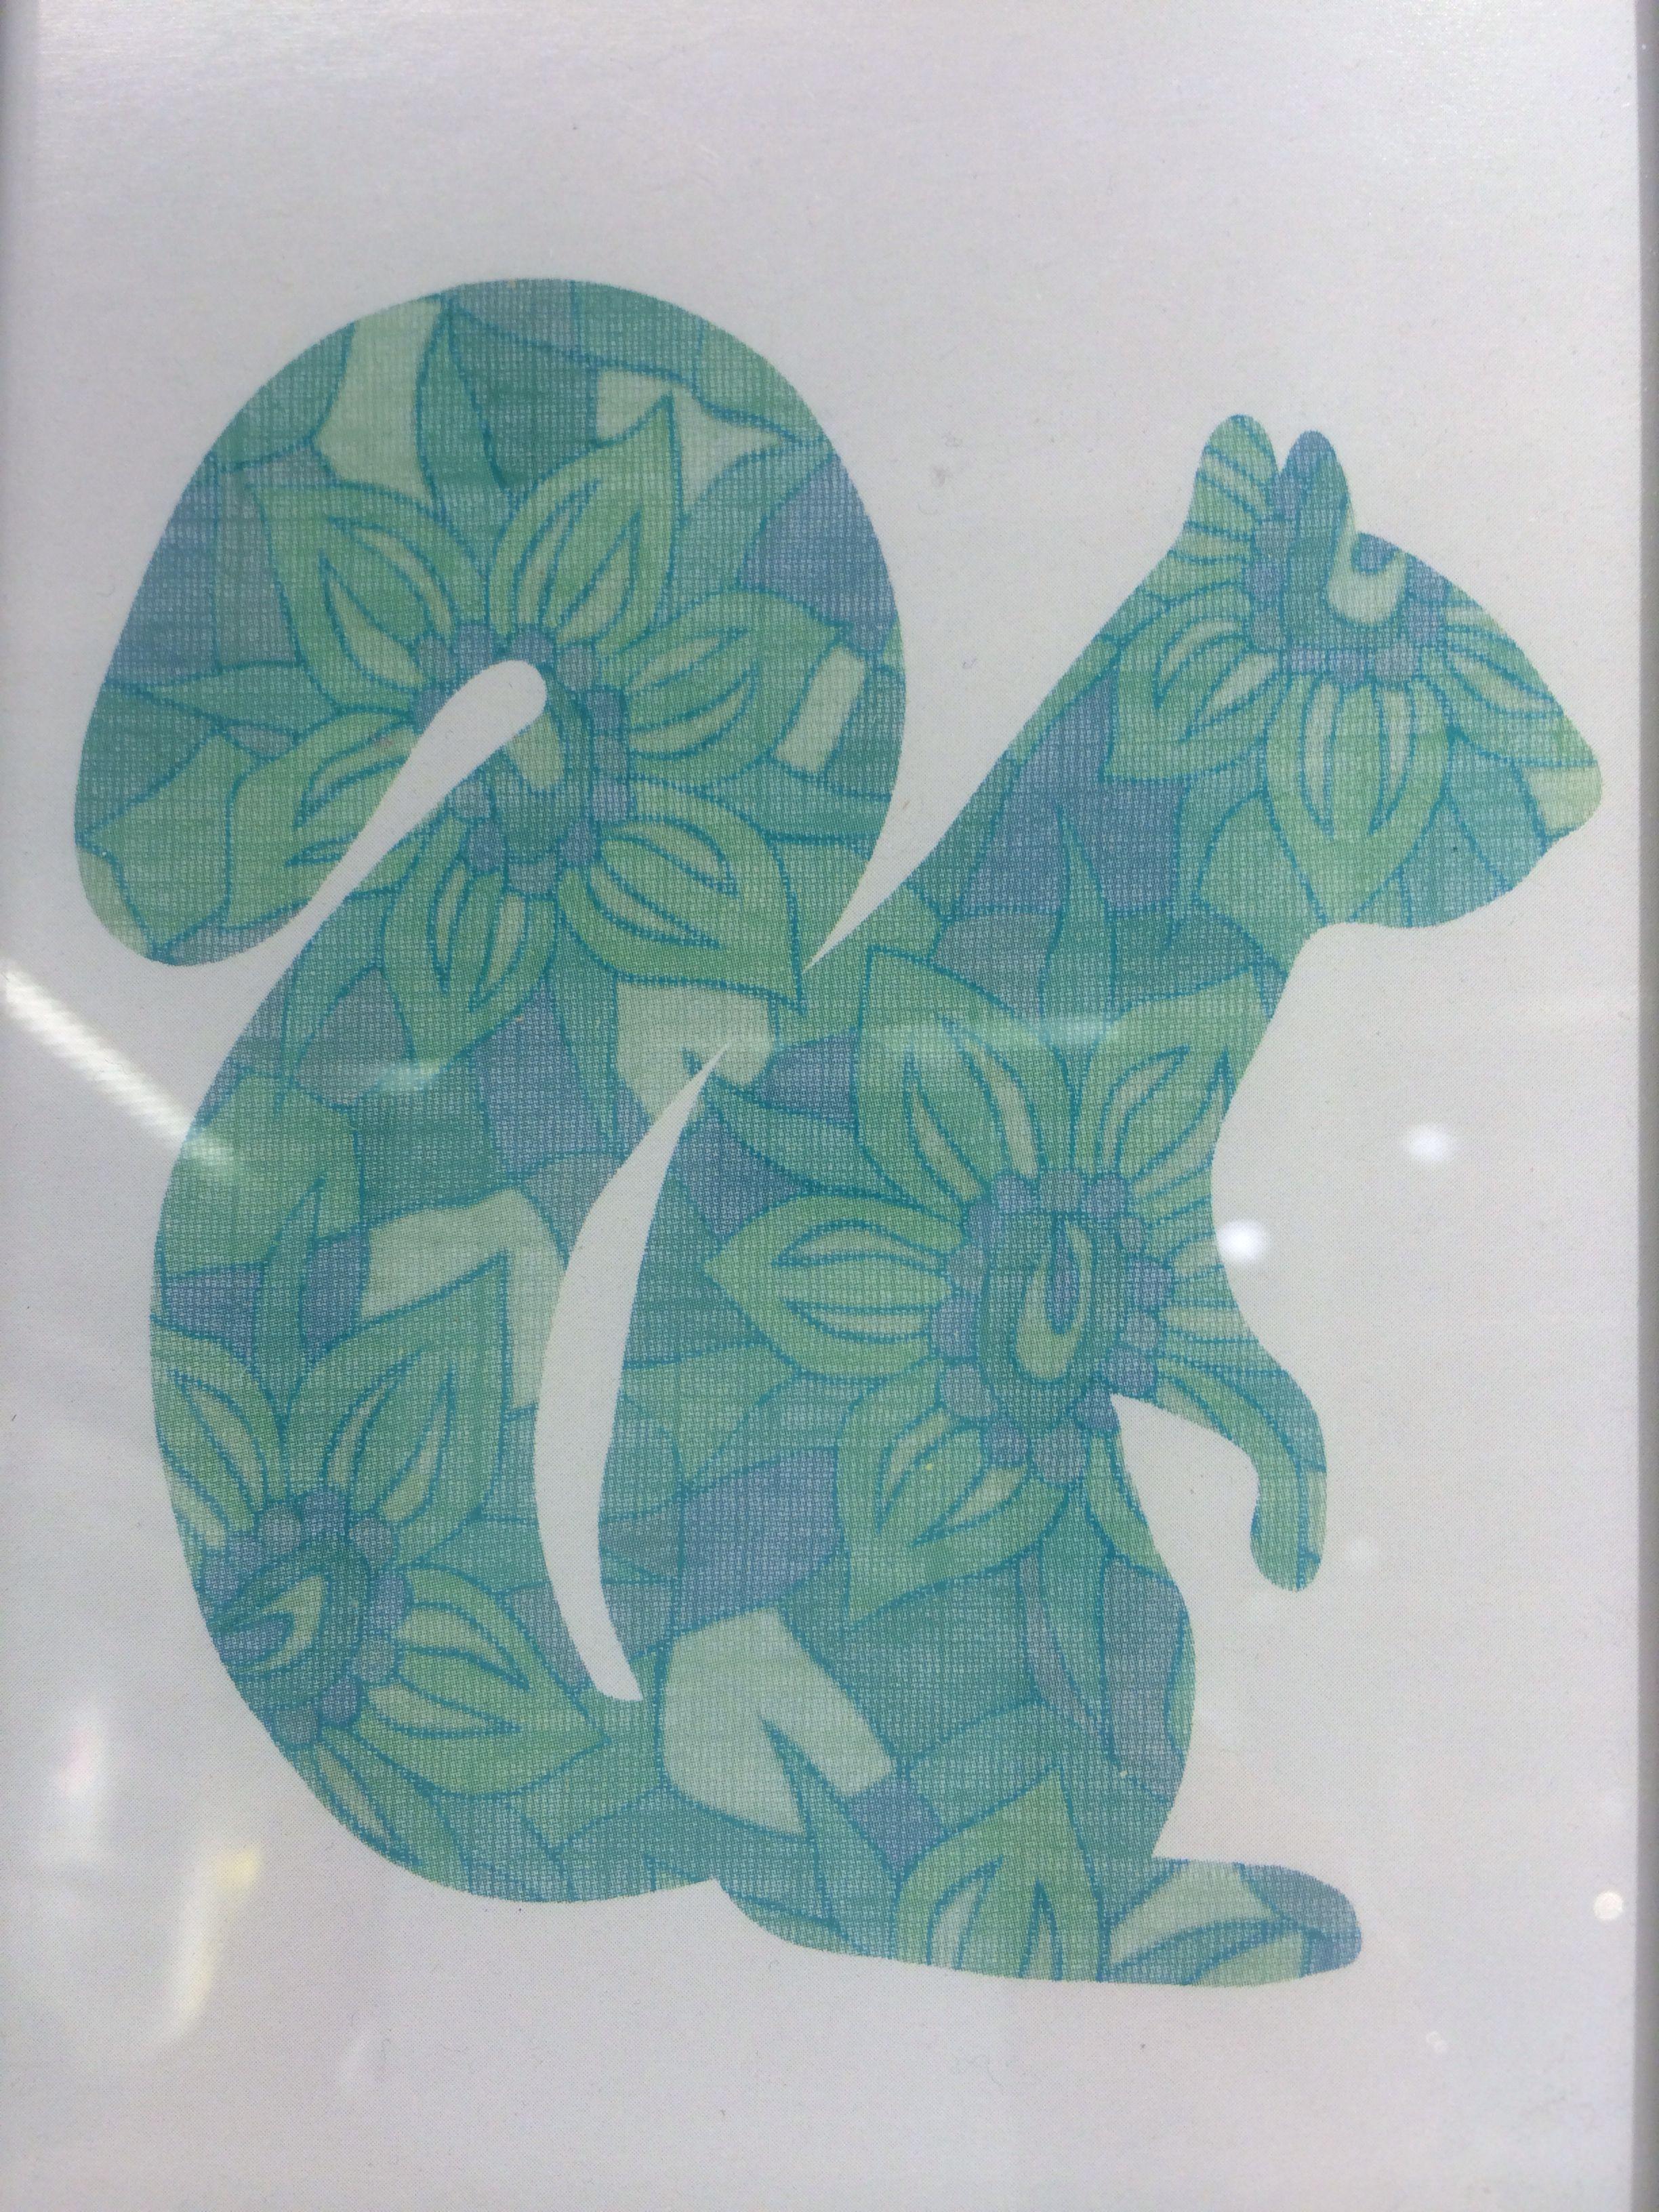 Fabric patterned silhouettes ikea fabric patterns